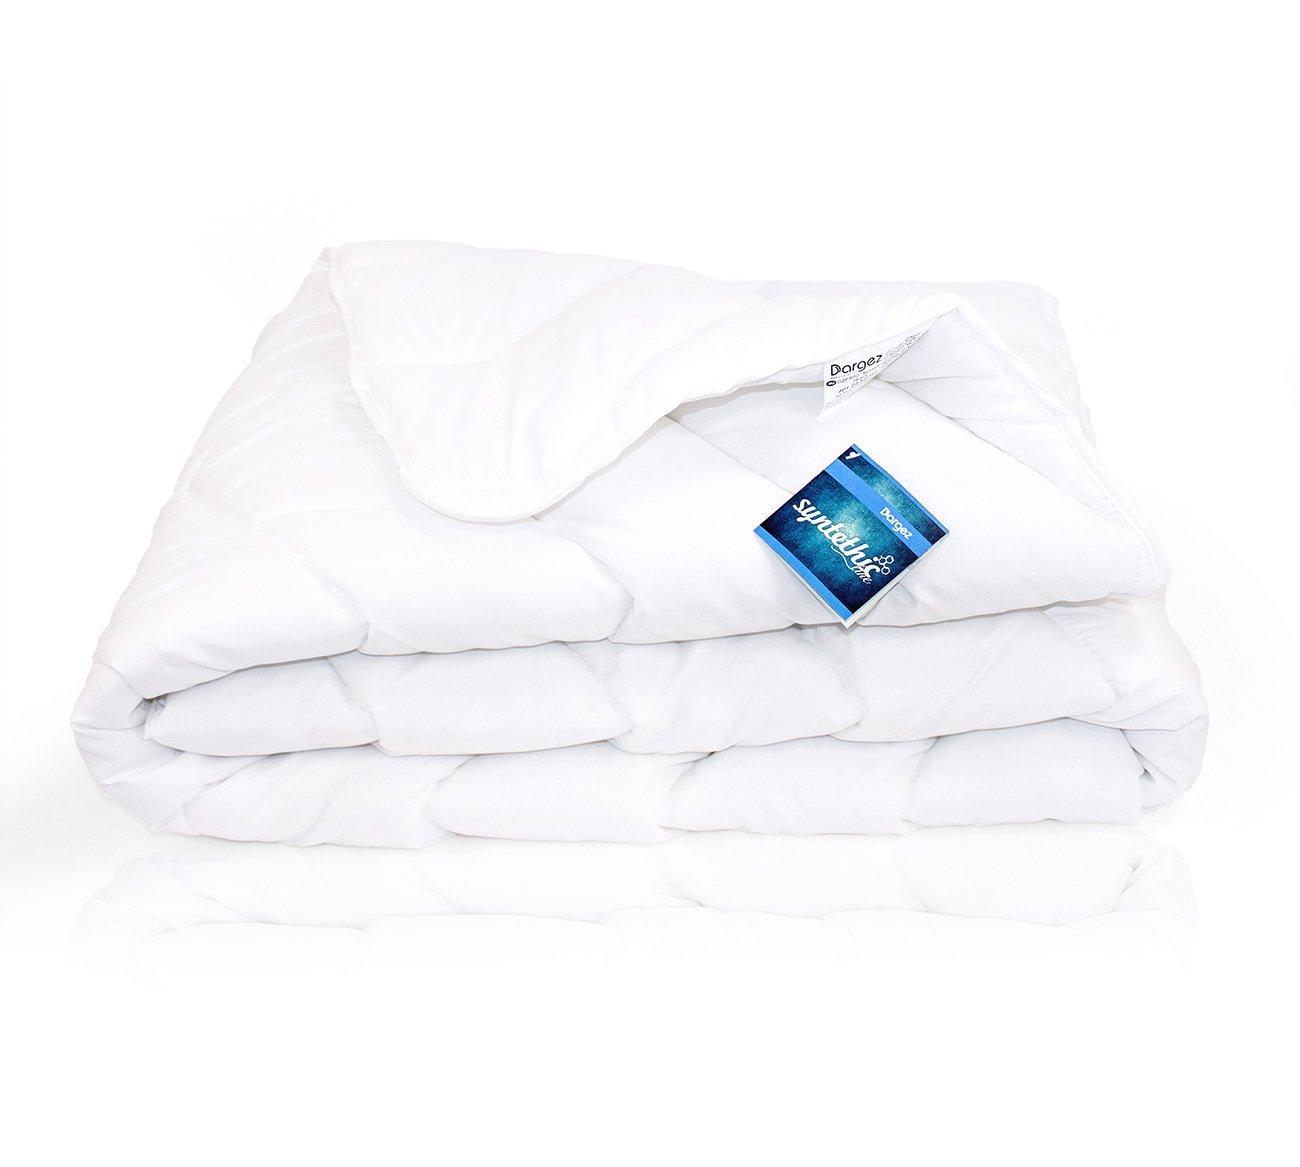 Подушки и одеяла из лебяжьего пуха Милан Даргез